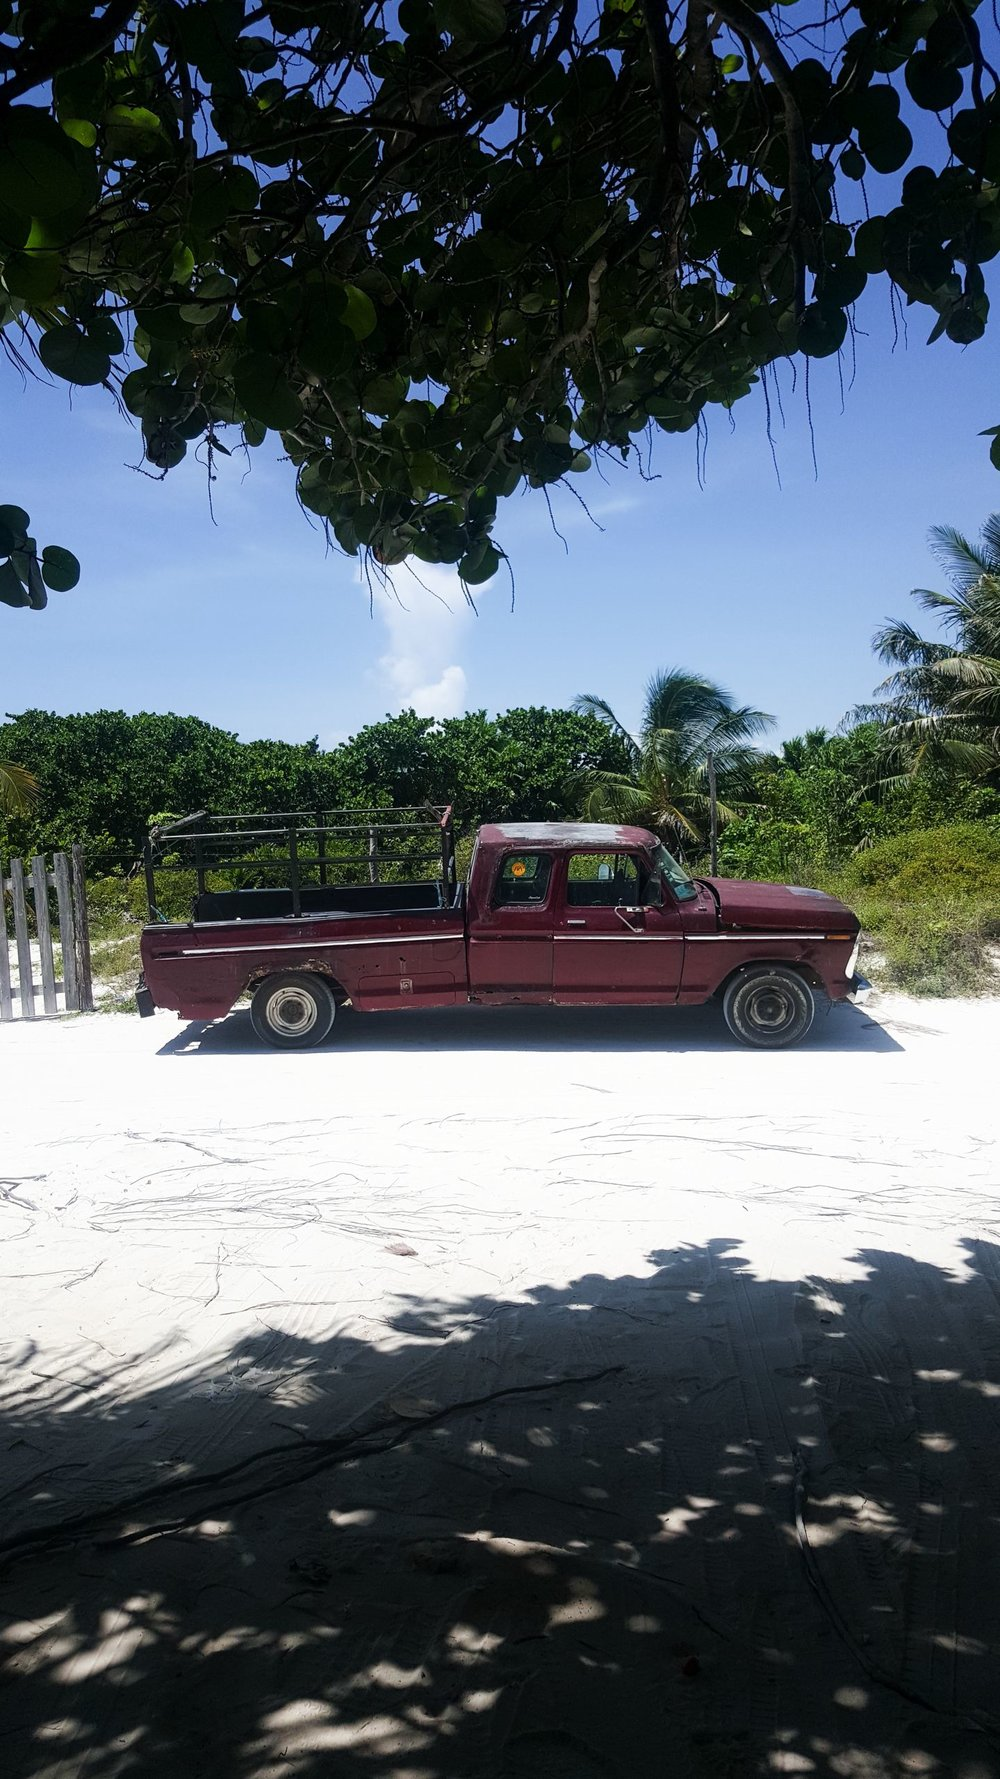 Steen-Jones-Artist-Travel-Mexico-13.jpg